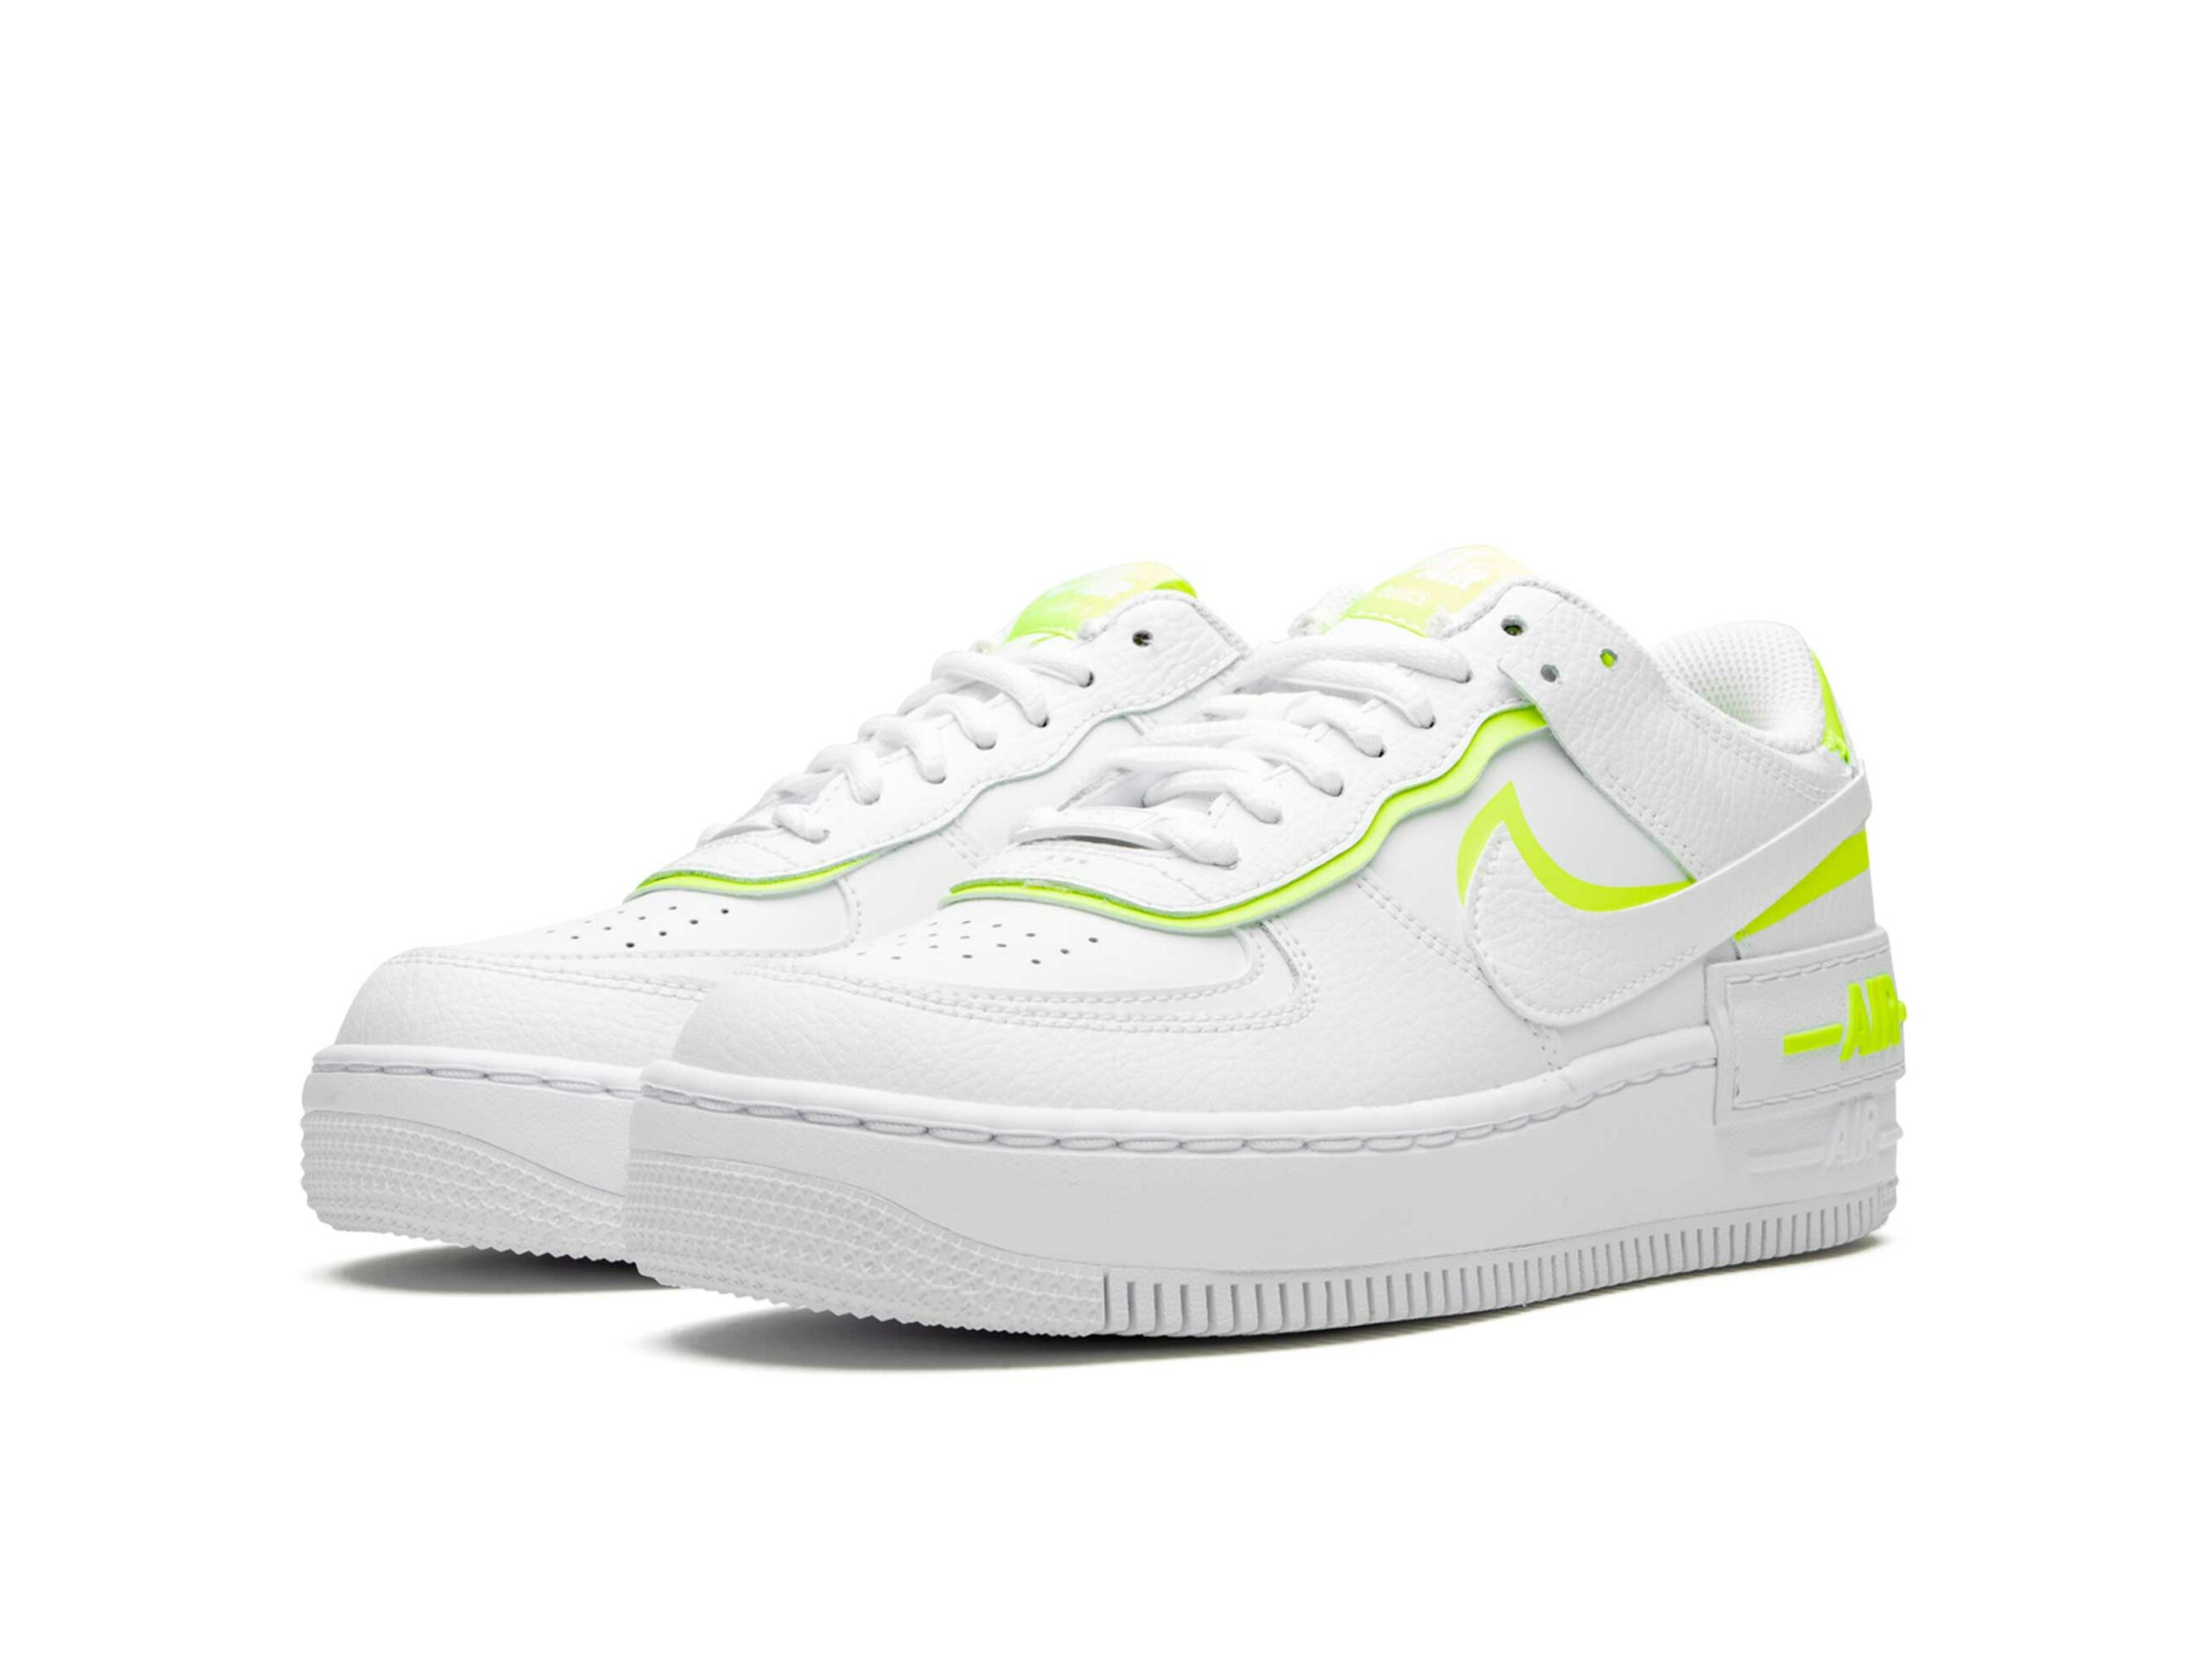 nike air force 1 shadow white lemon CI0919_104 купить